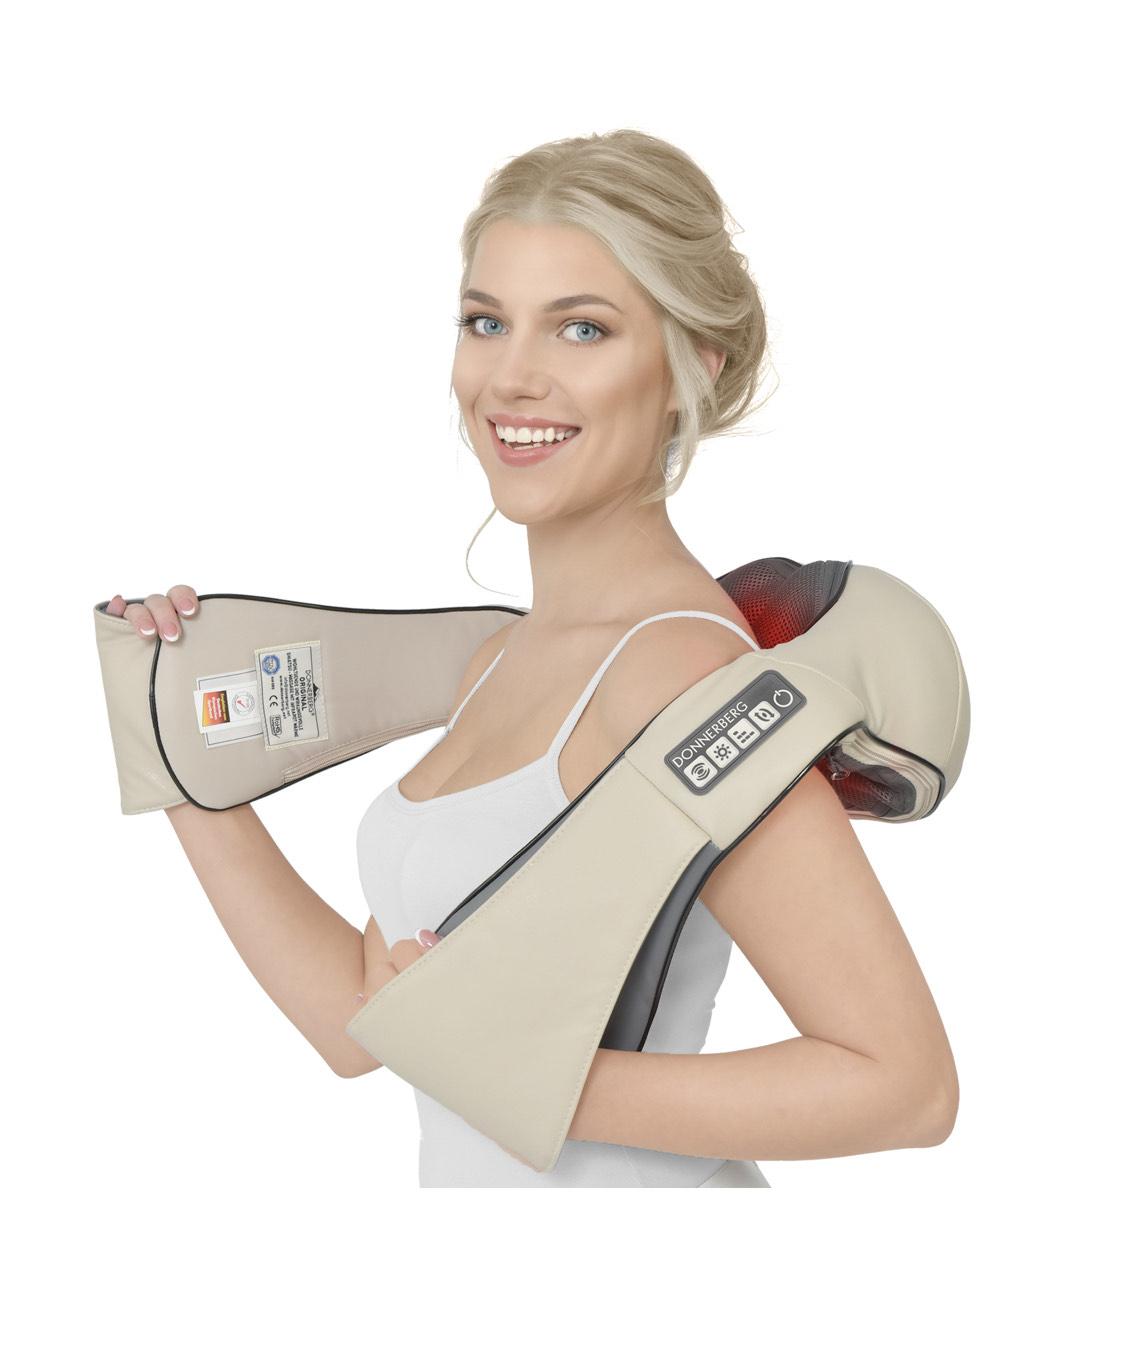 (Real online) Donnerberg (Nacken-)Massagegerät Premium, Klopfy, Basic